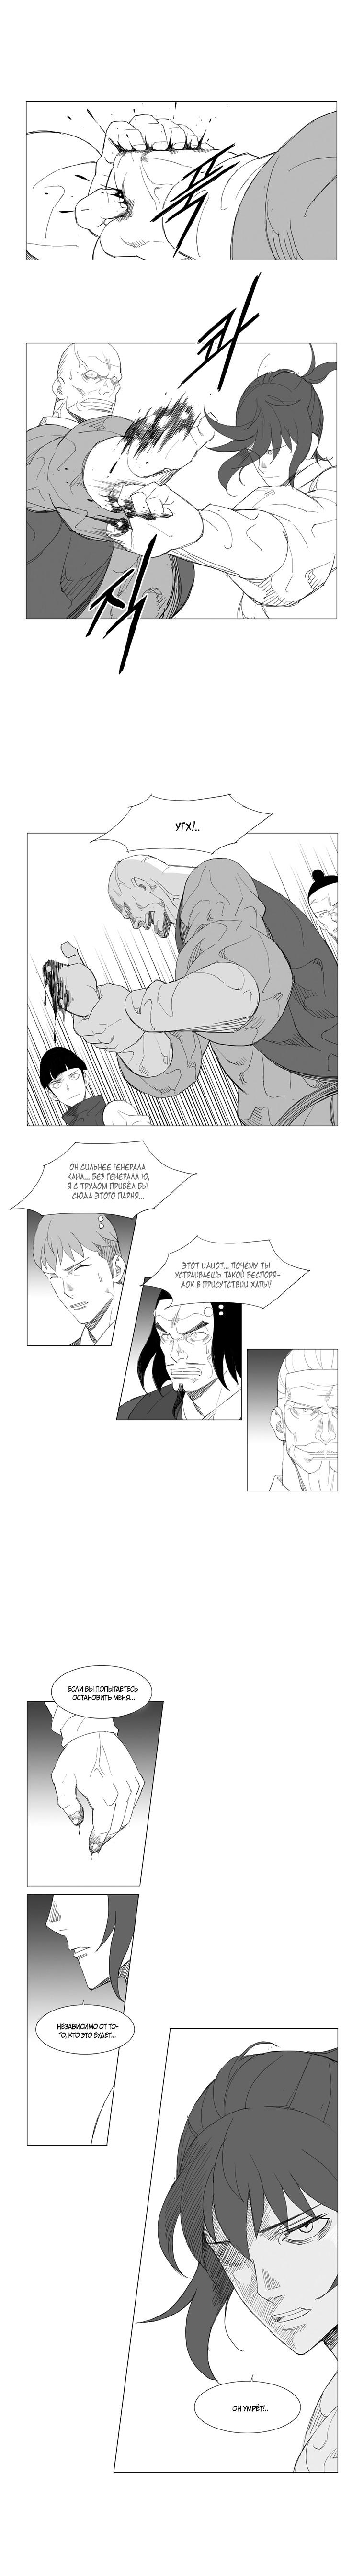 https://r1.ninemanga.com/comics/pic2/39/28263/411639/1523649907803.jpg Page 4